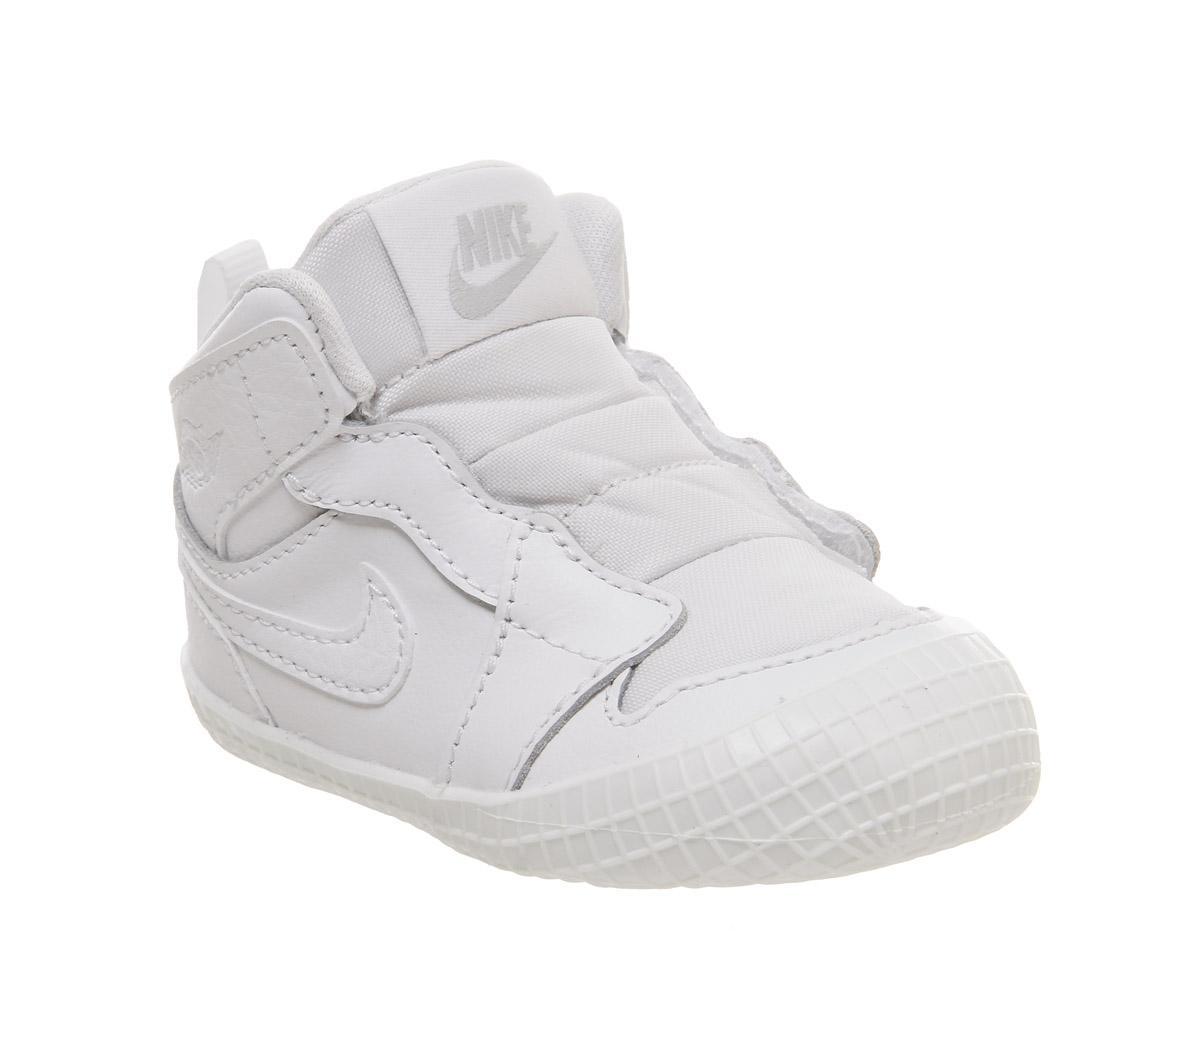 Jordan 1 Crib Booties